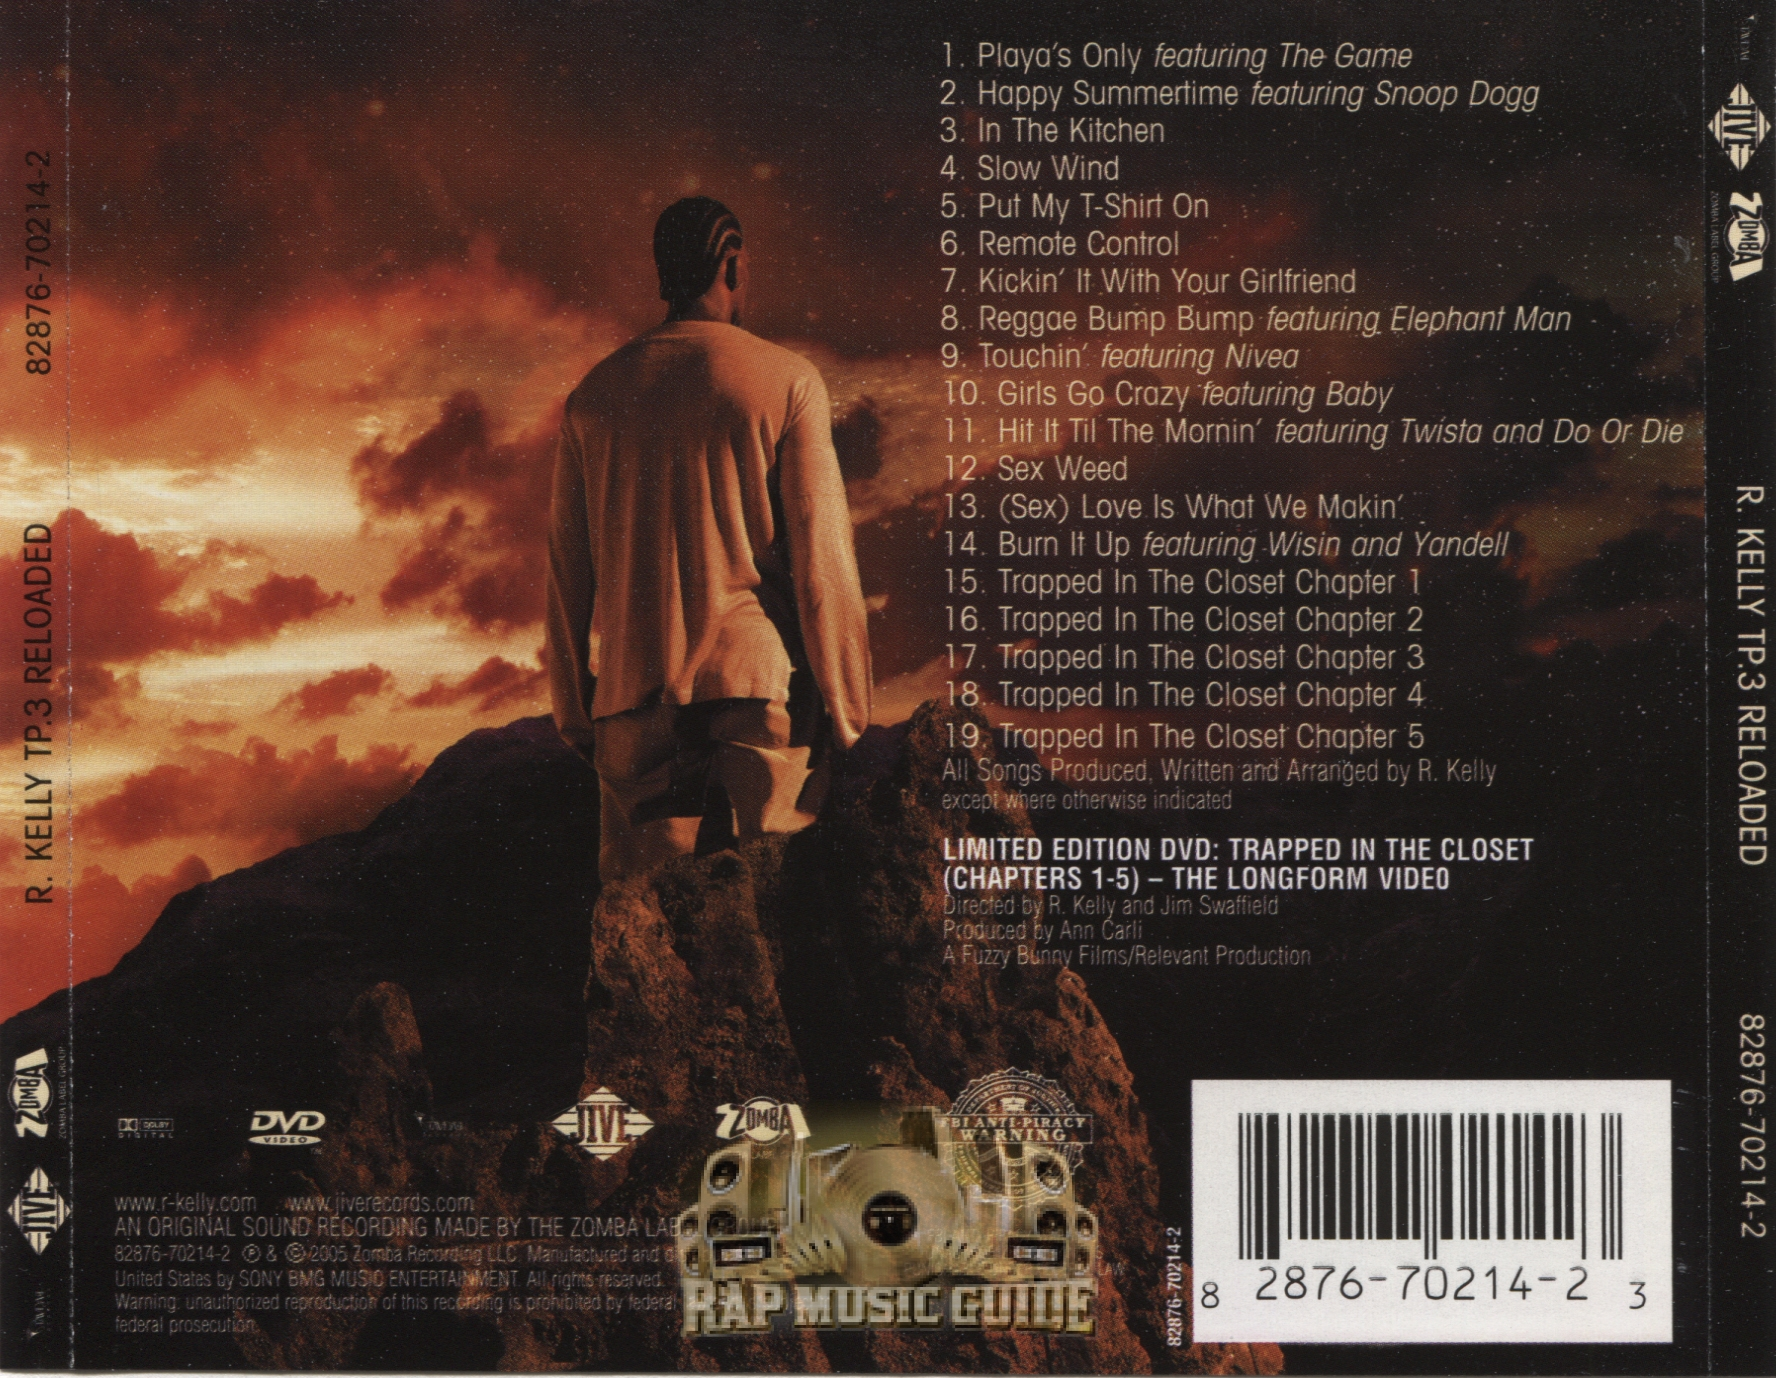 R Kelly Tp 3 Reloaded Cd Rap Music Guide